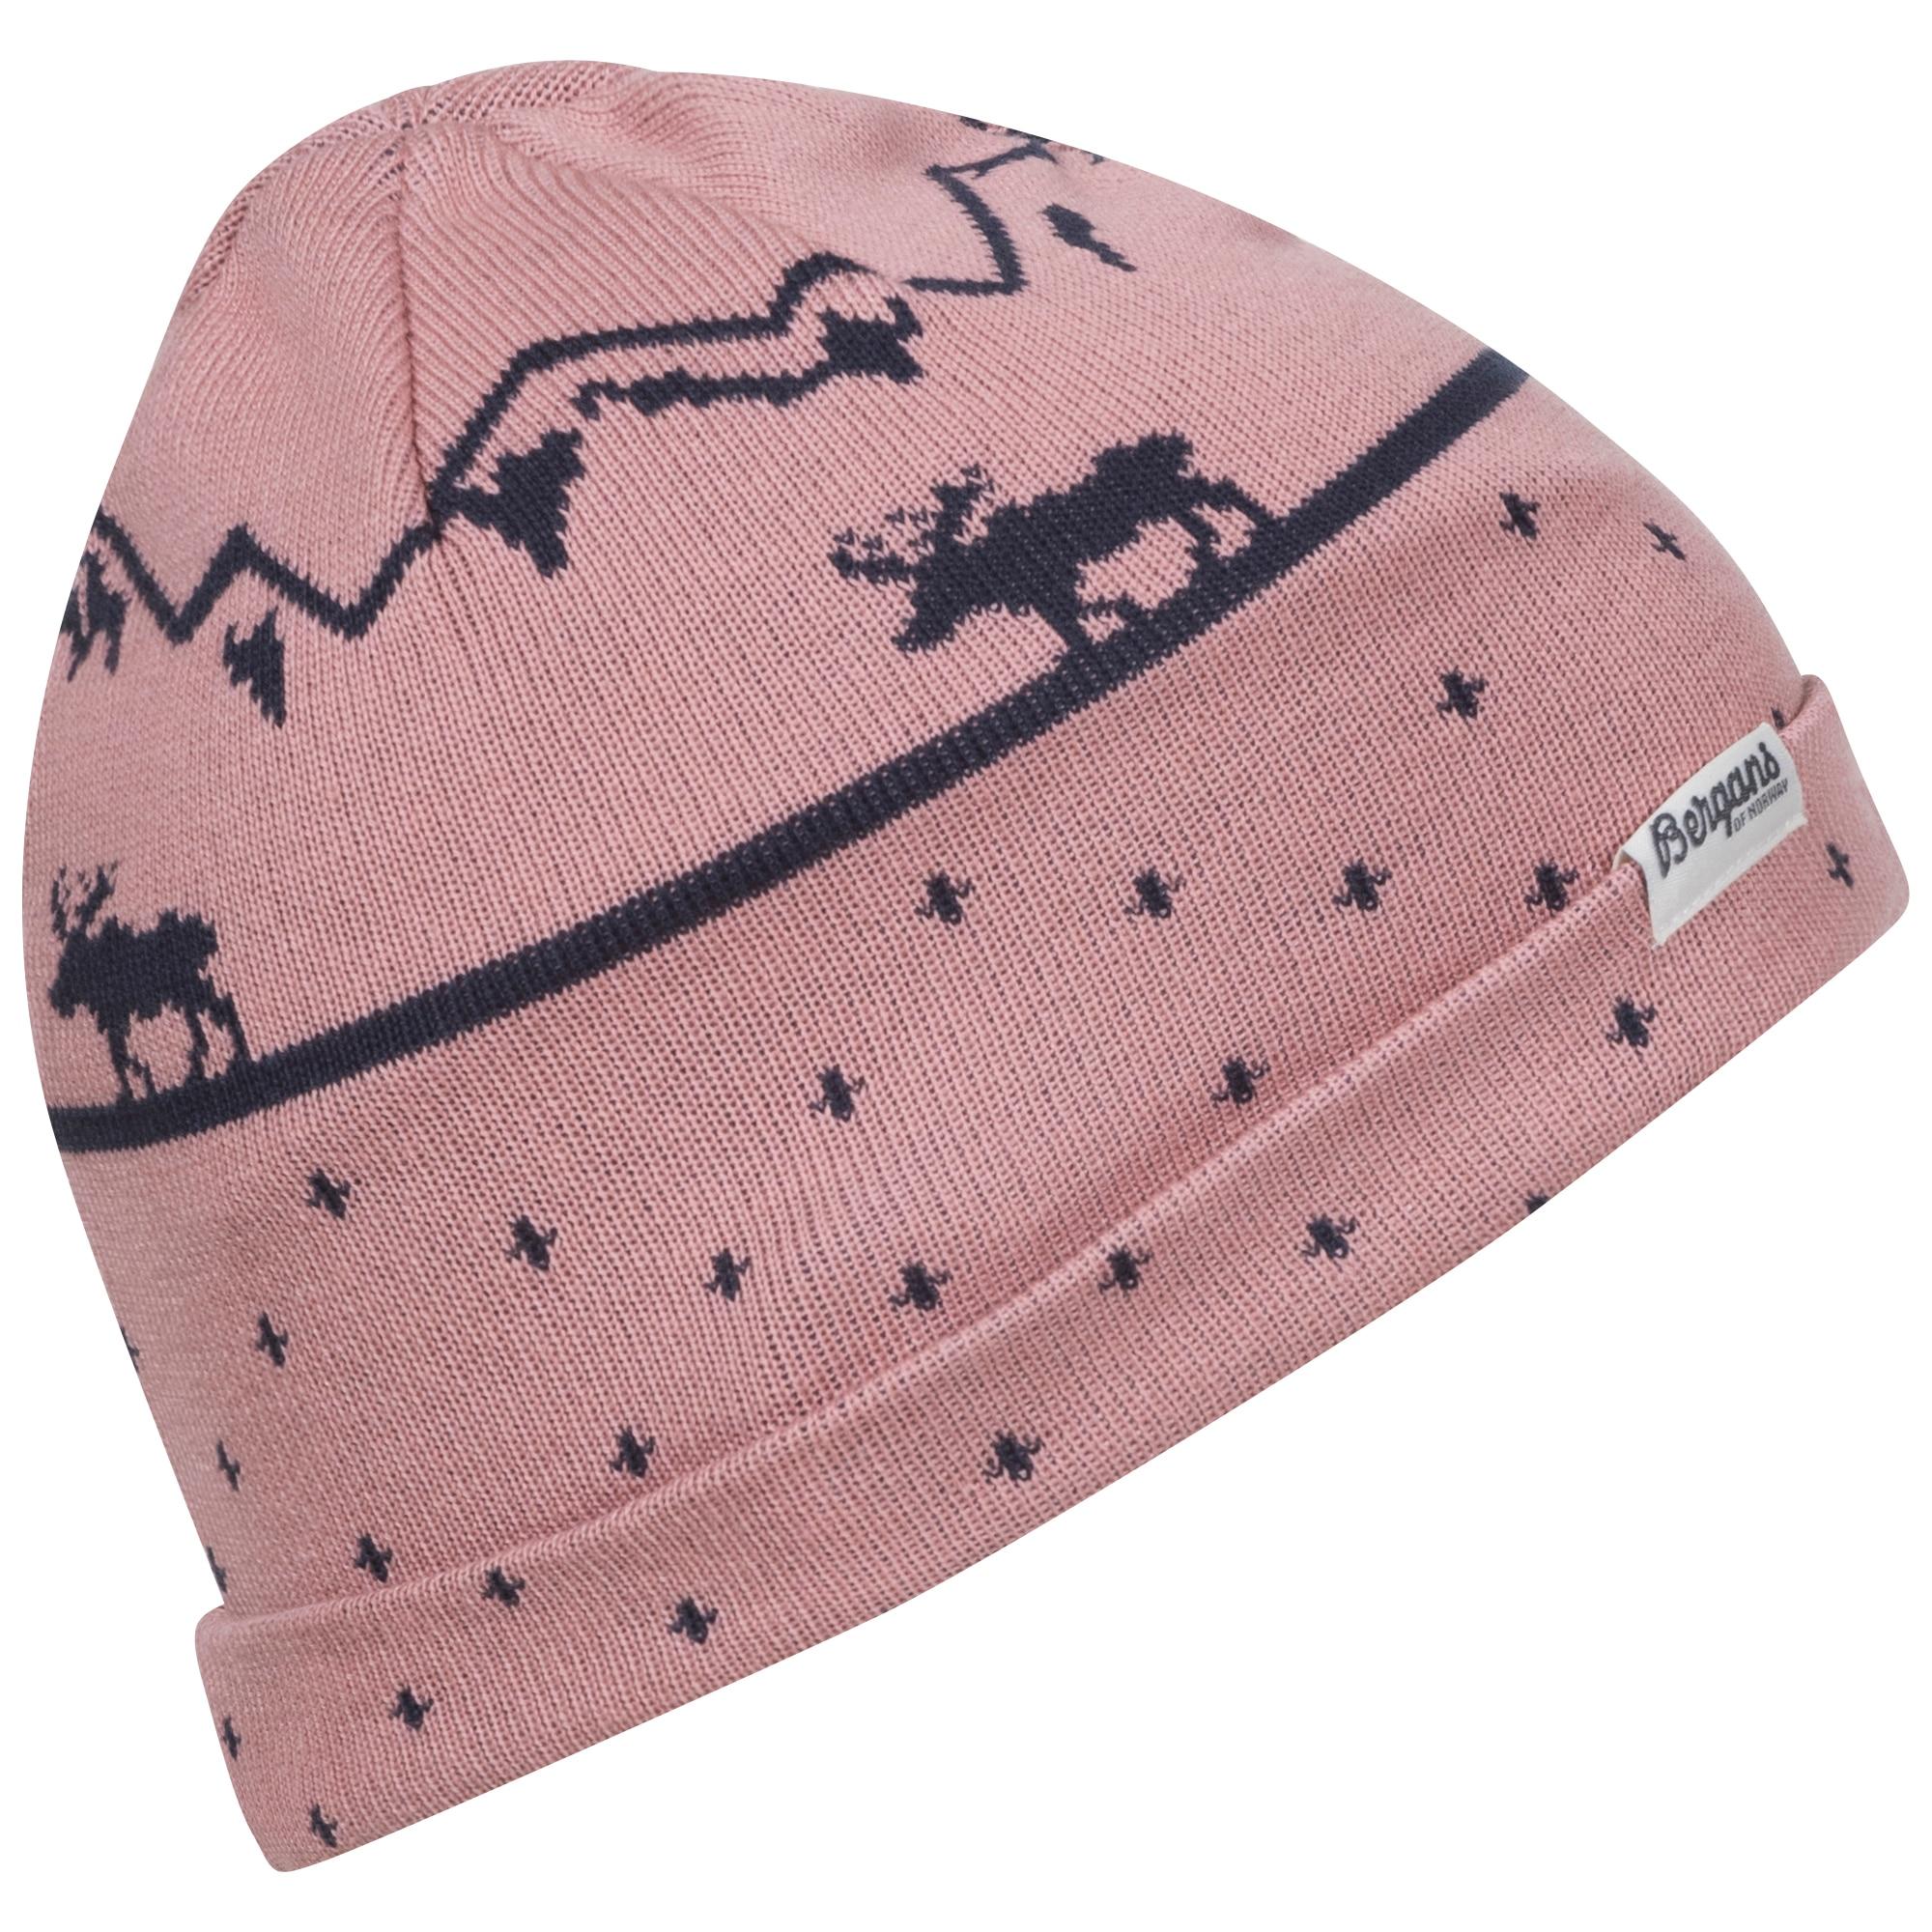 Mountain Moose Kids Beanie